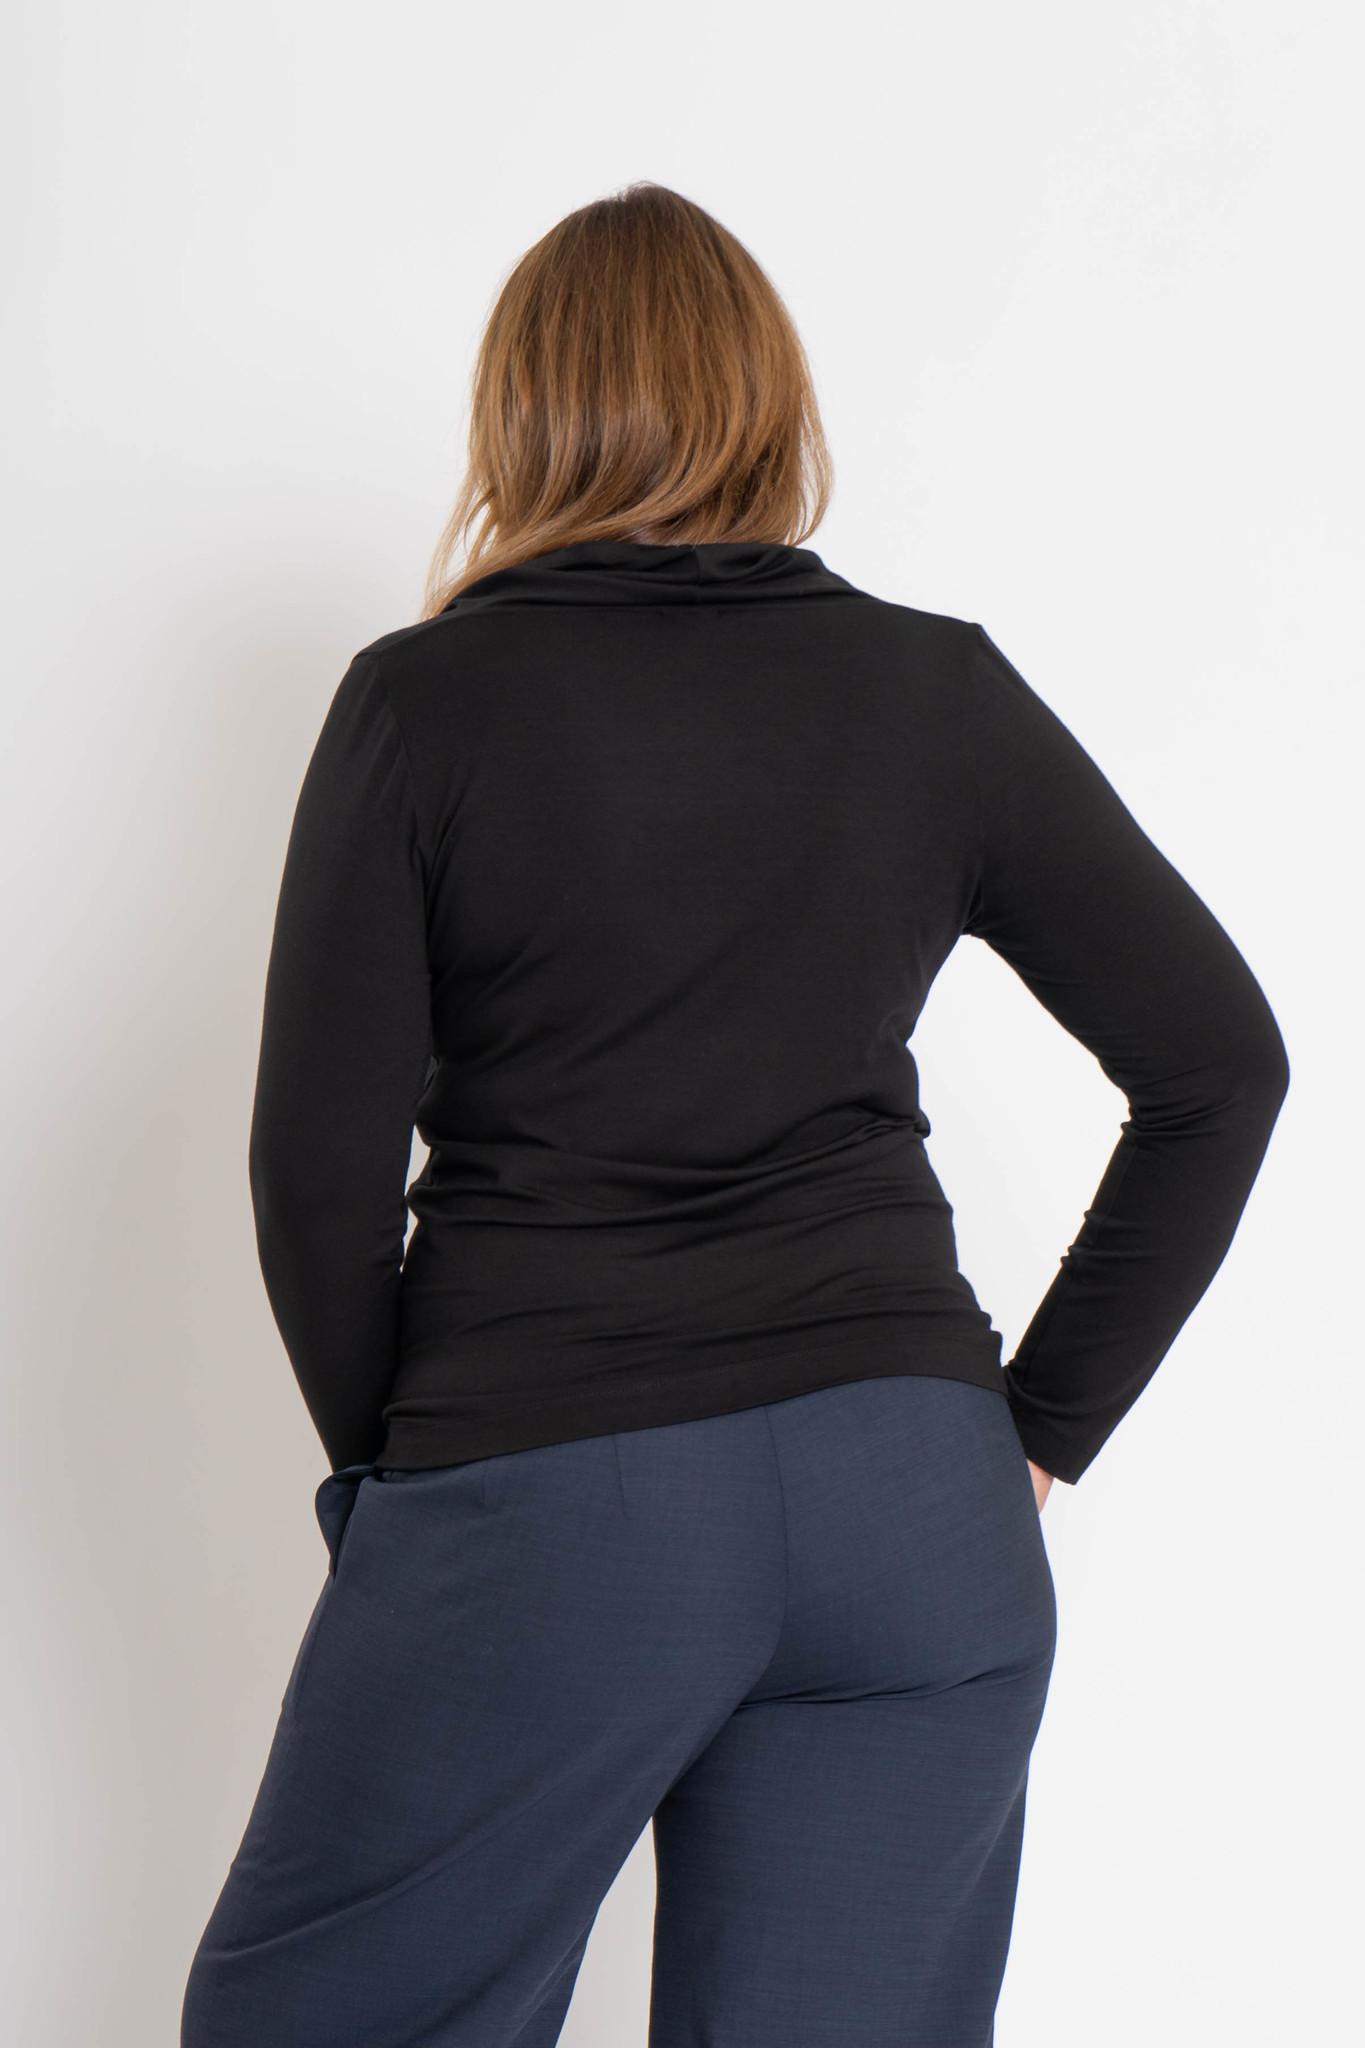 VENUS Shirt in Viscose and Silk-3